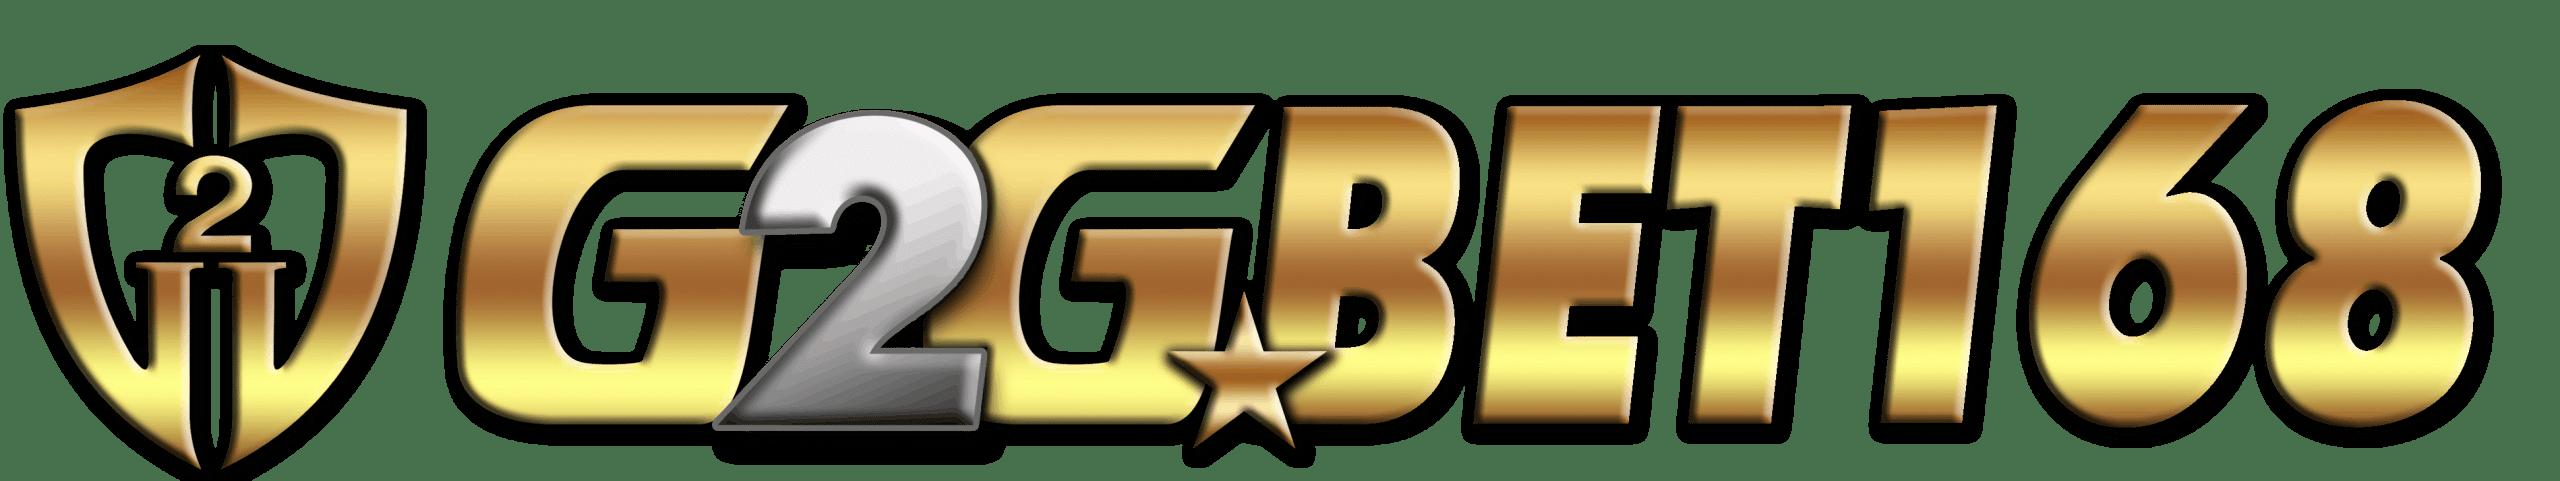 g2gbet logo สล็อต